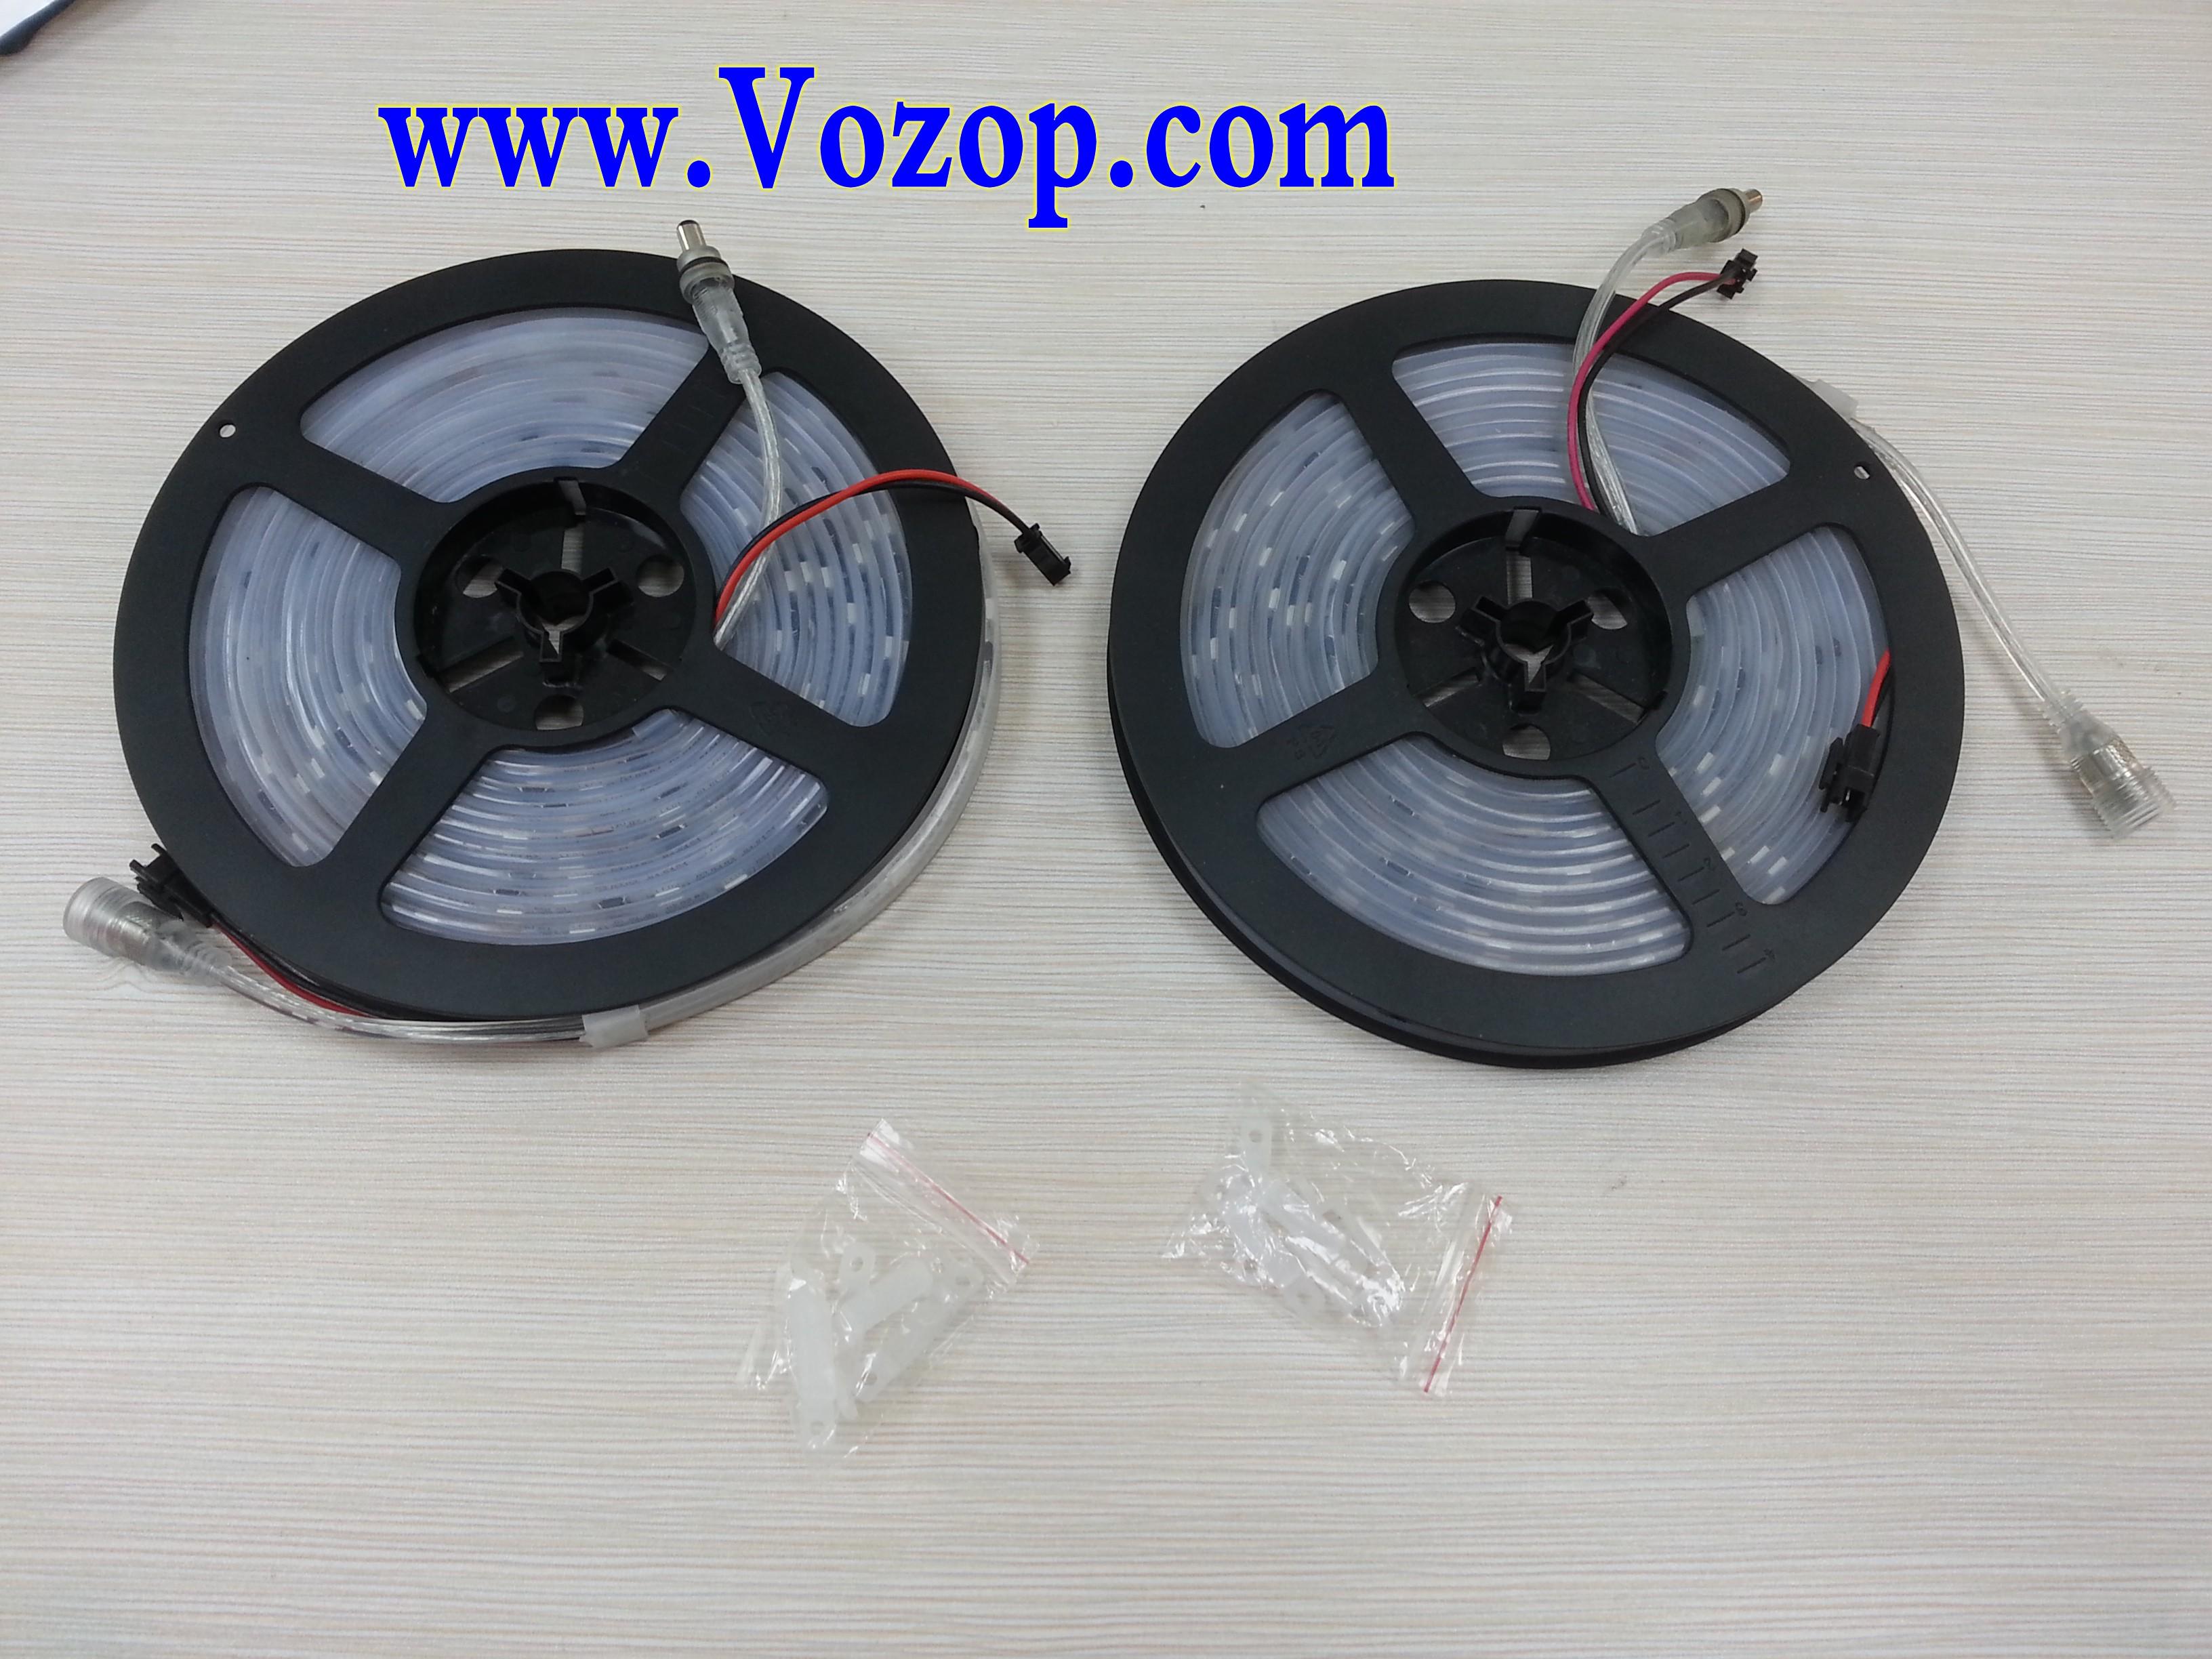 Waterproof_16.4_Feet_TM1812_RGB_LED_5050_LED_Flexible_tape_Strips